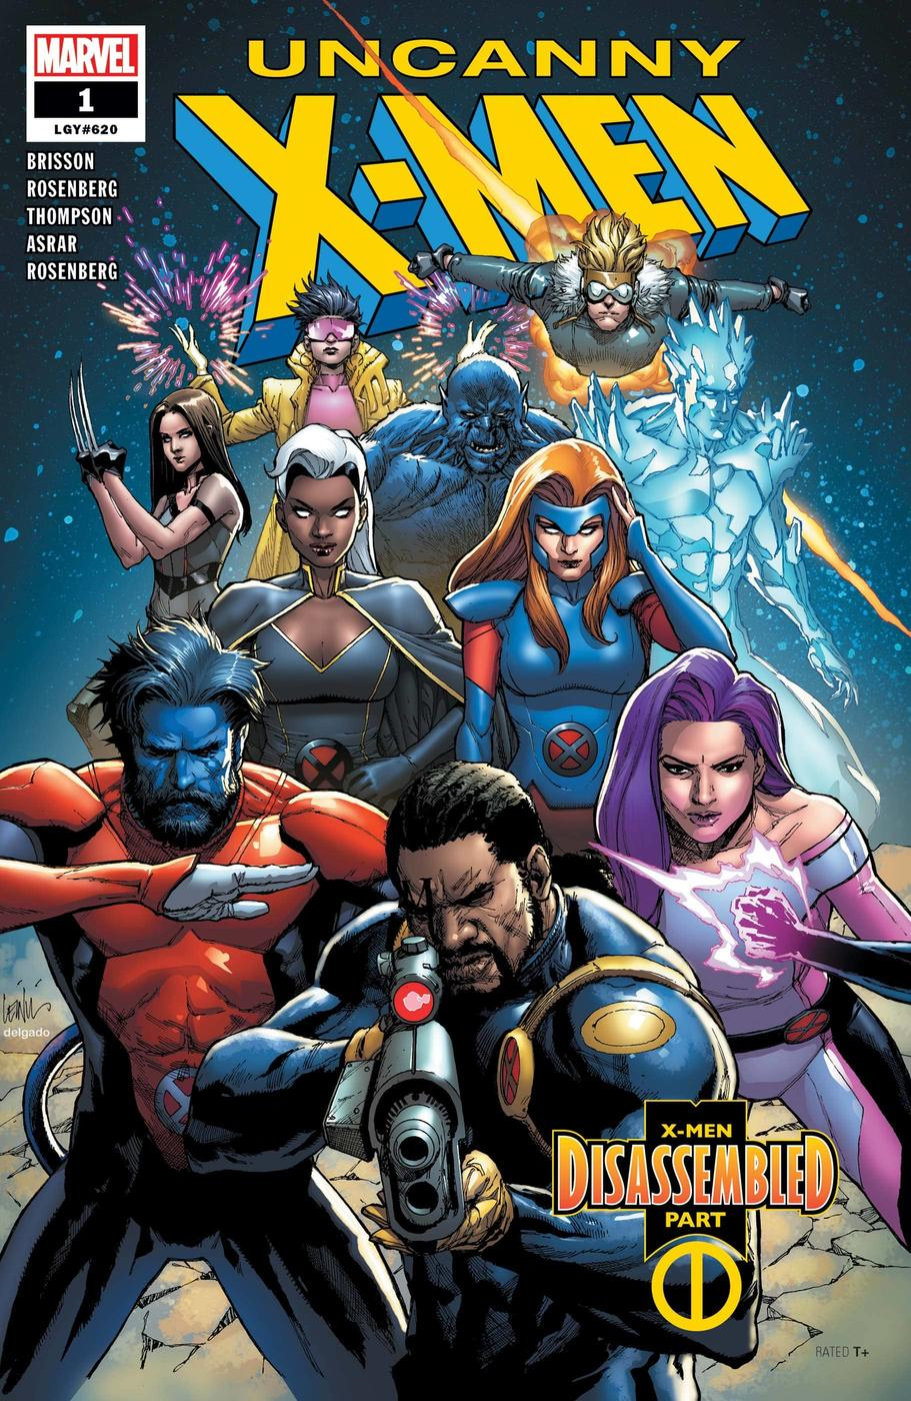 Uncanny X-Men (2018) #1